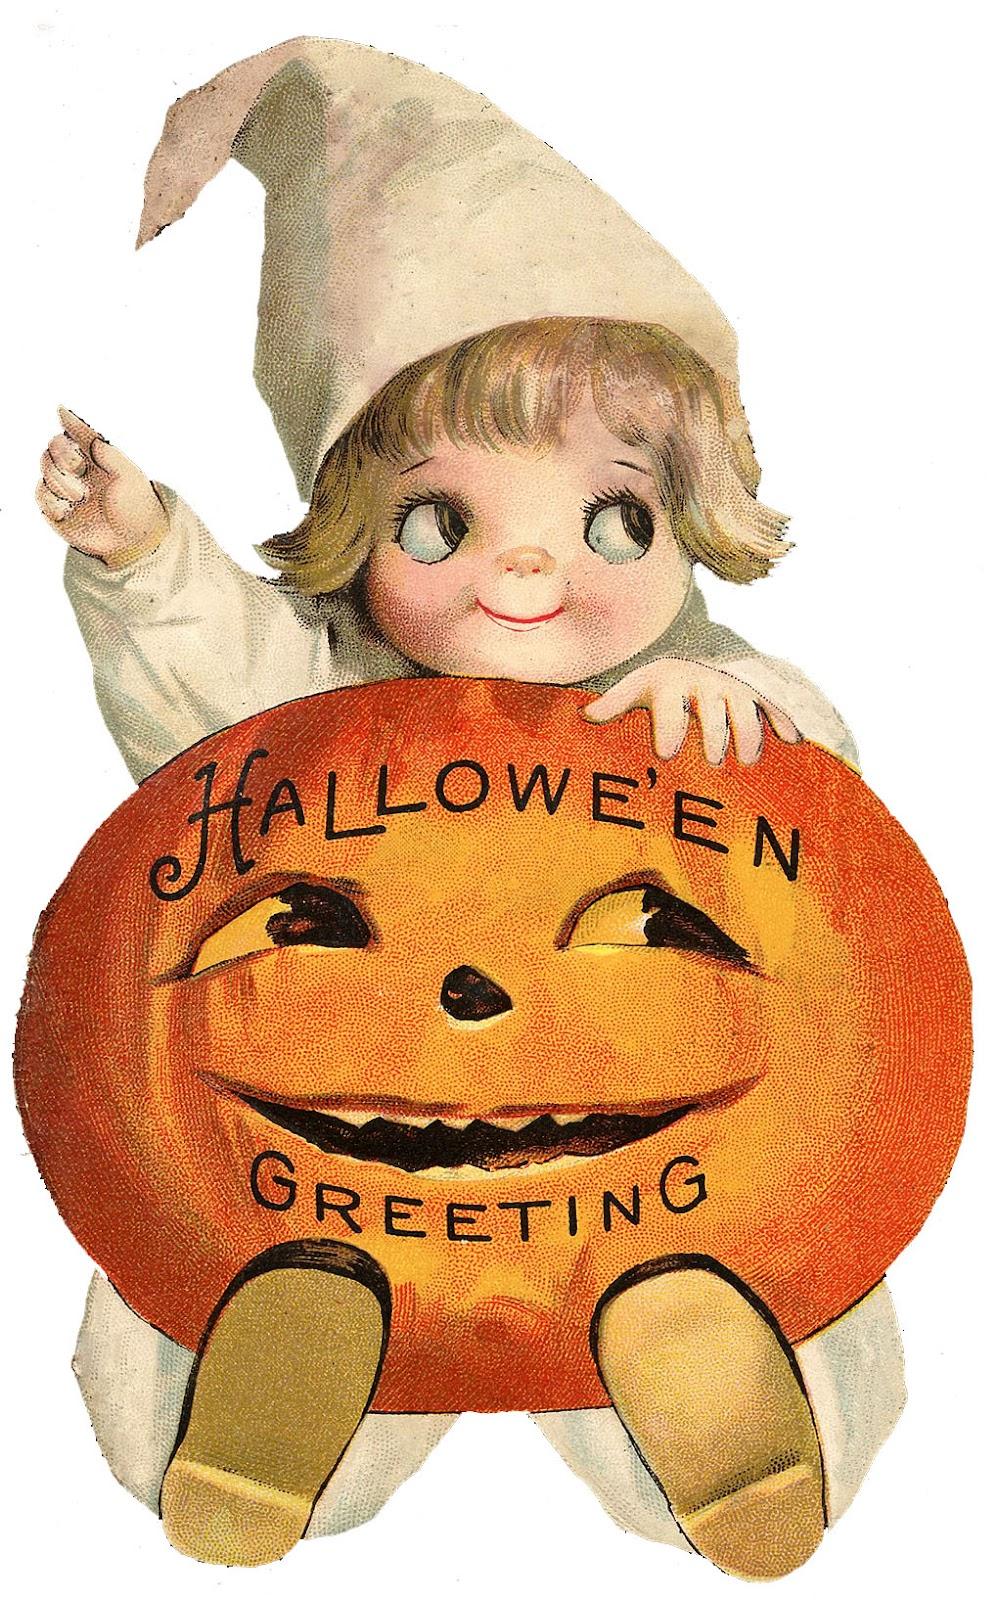 30 vintage halloween.